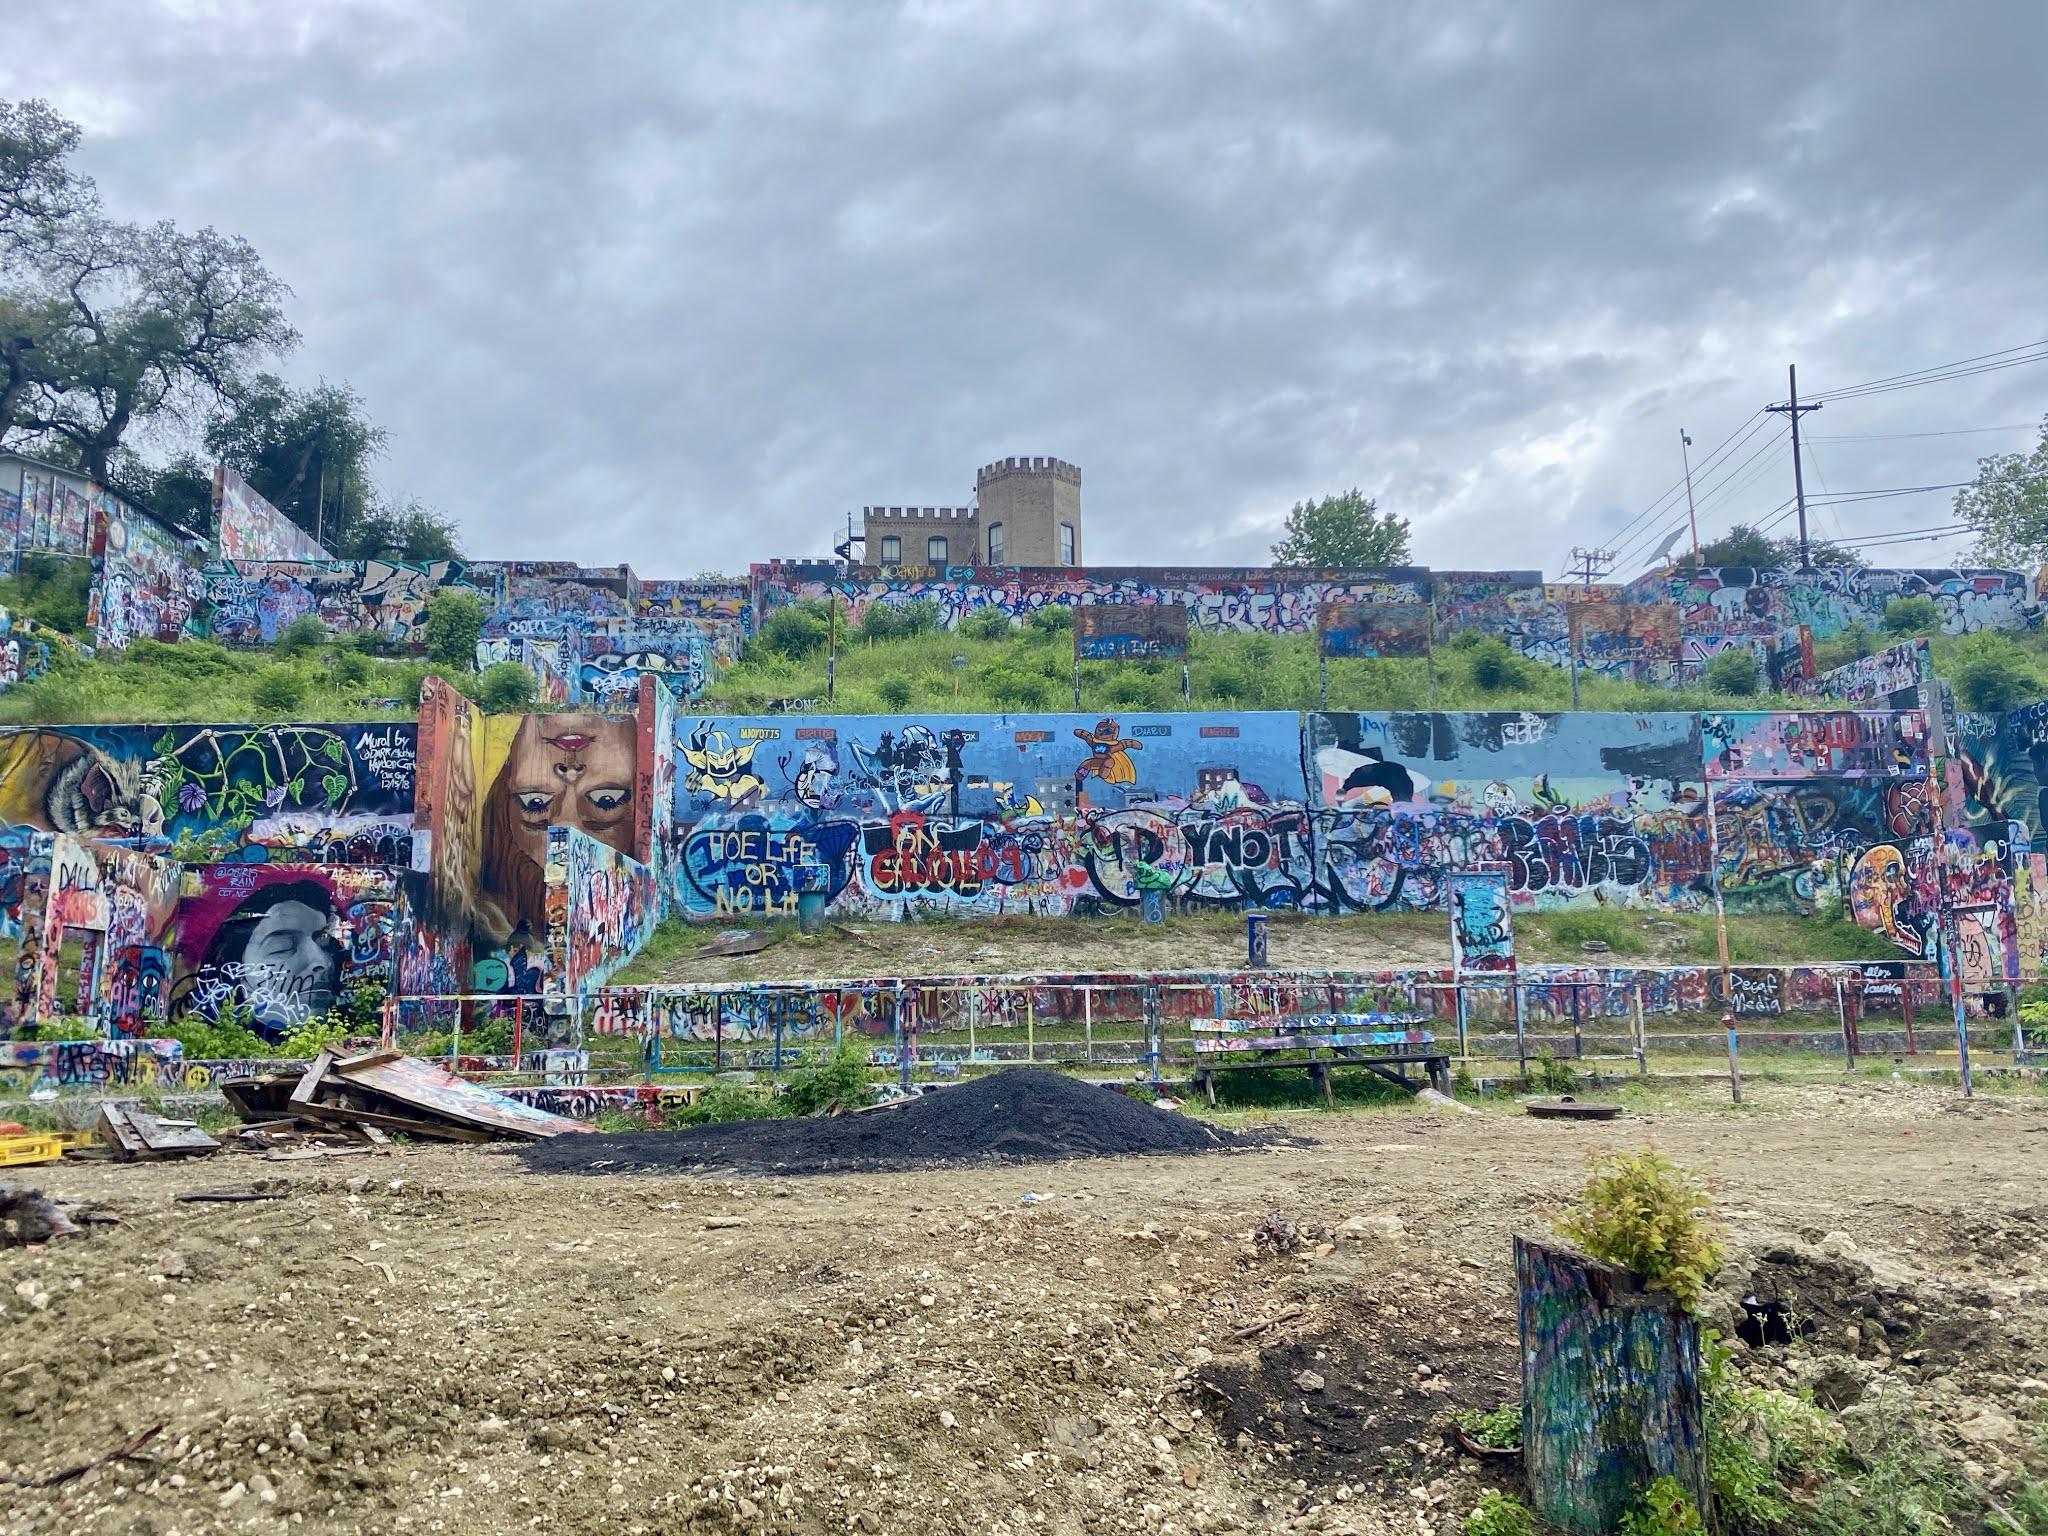 Graffiti Wall in Austin, Texas | www.biblio-style.com